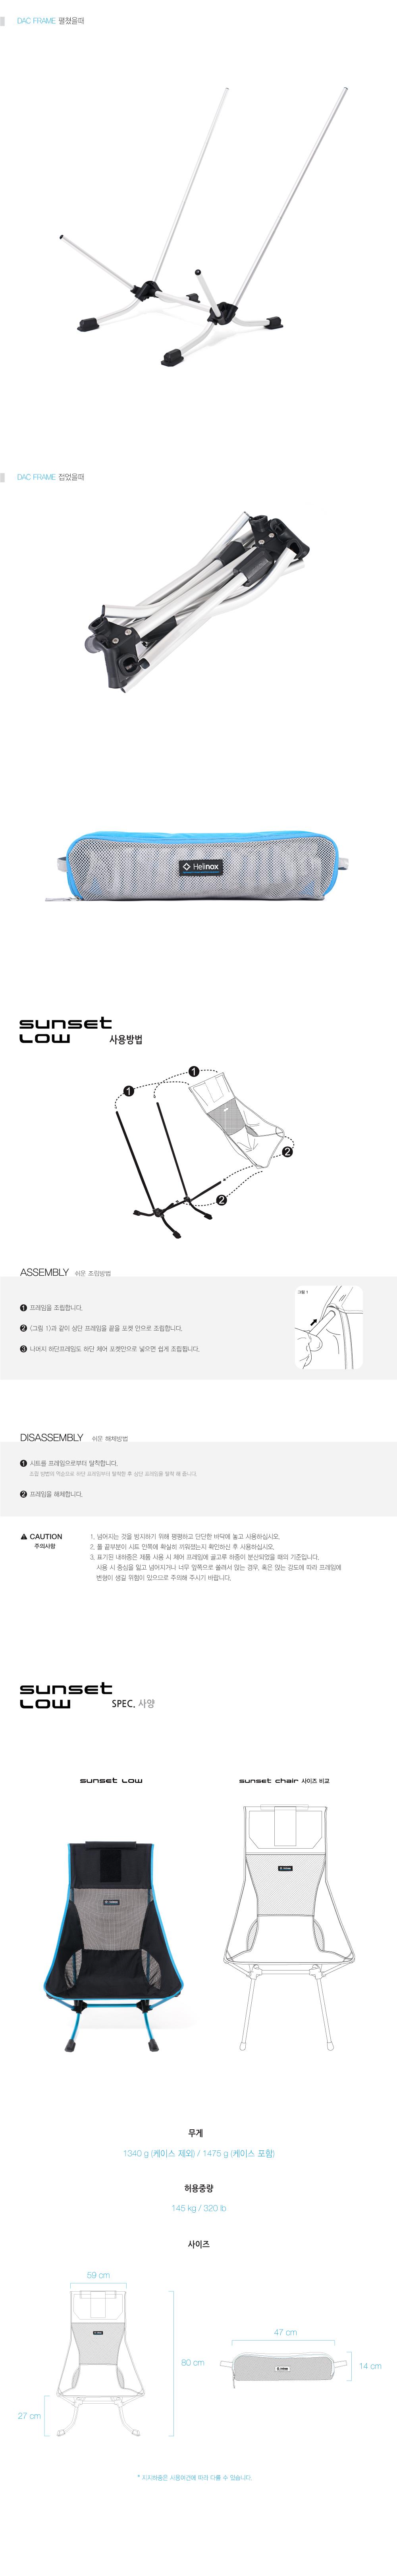 20150720-Helinox_beach-chair_상품페이지_Swedish-blue2.jpg